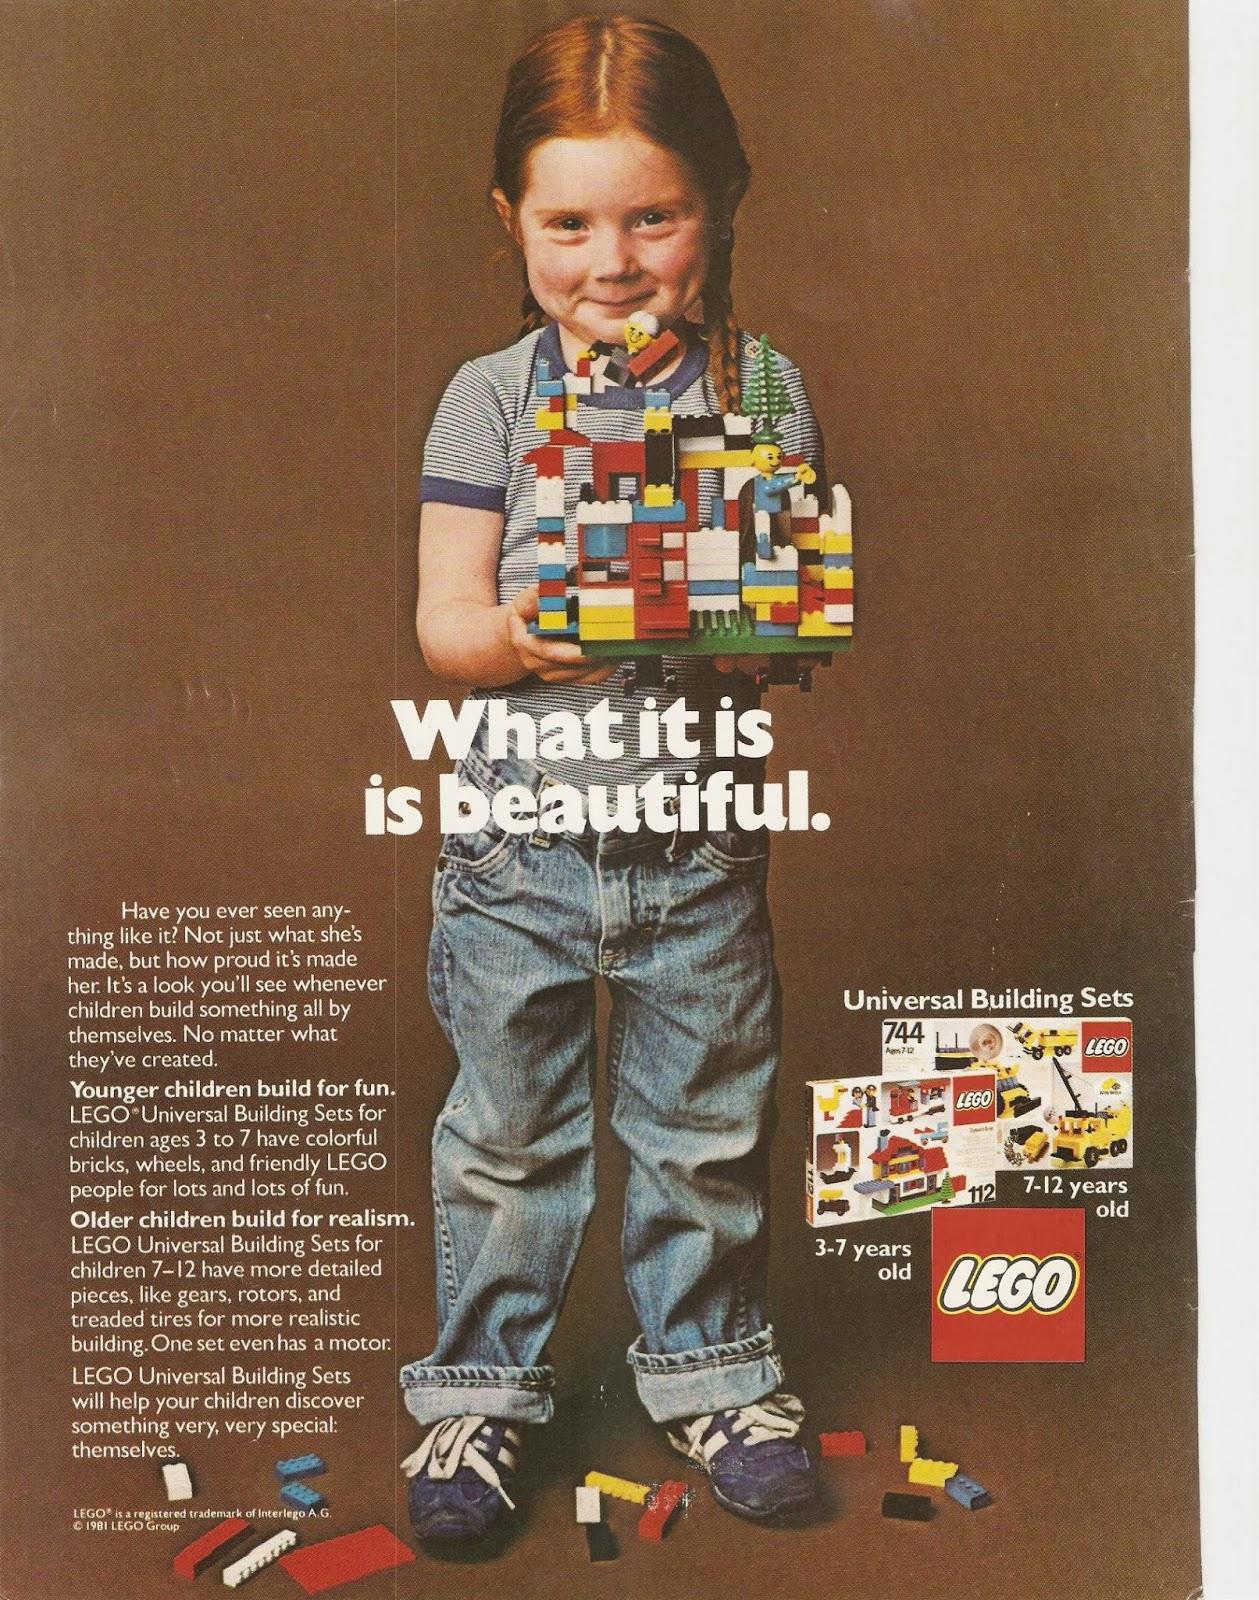 http://www.huffingtonpost.com/2014/01/17/lego-ad-1981_n_4617704.html